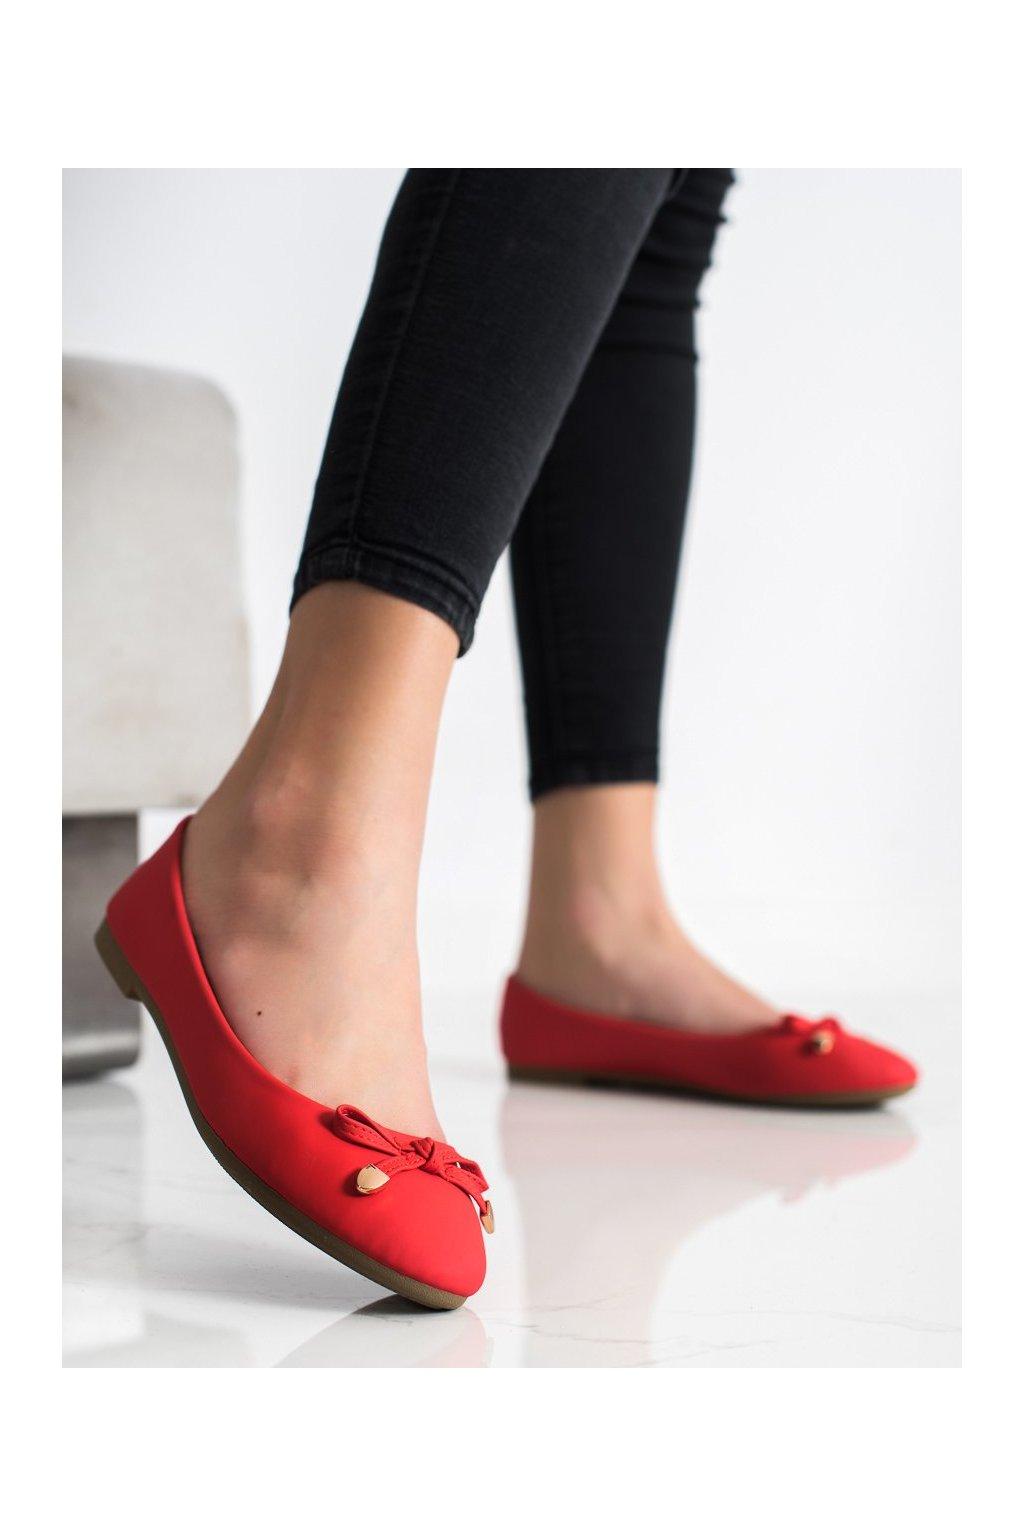 Červené dámske balerínky Diamantique kod YSD819R